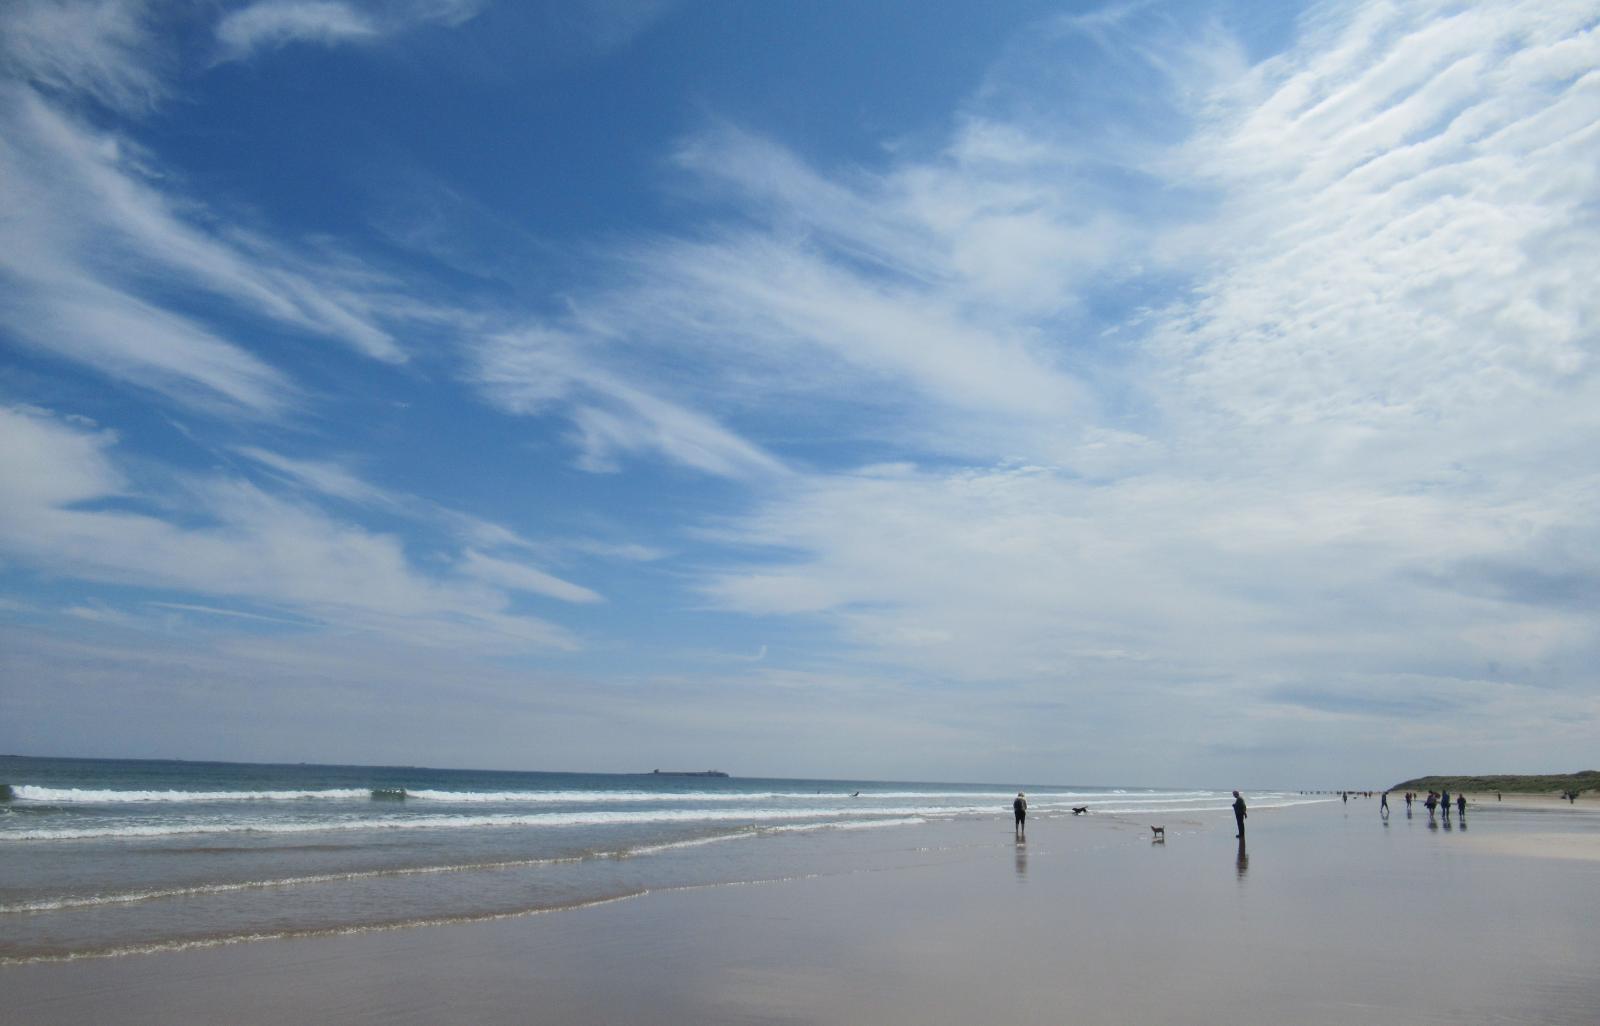 Cirrus clouds on beach